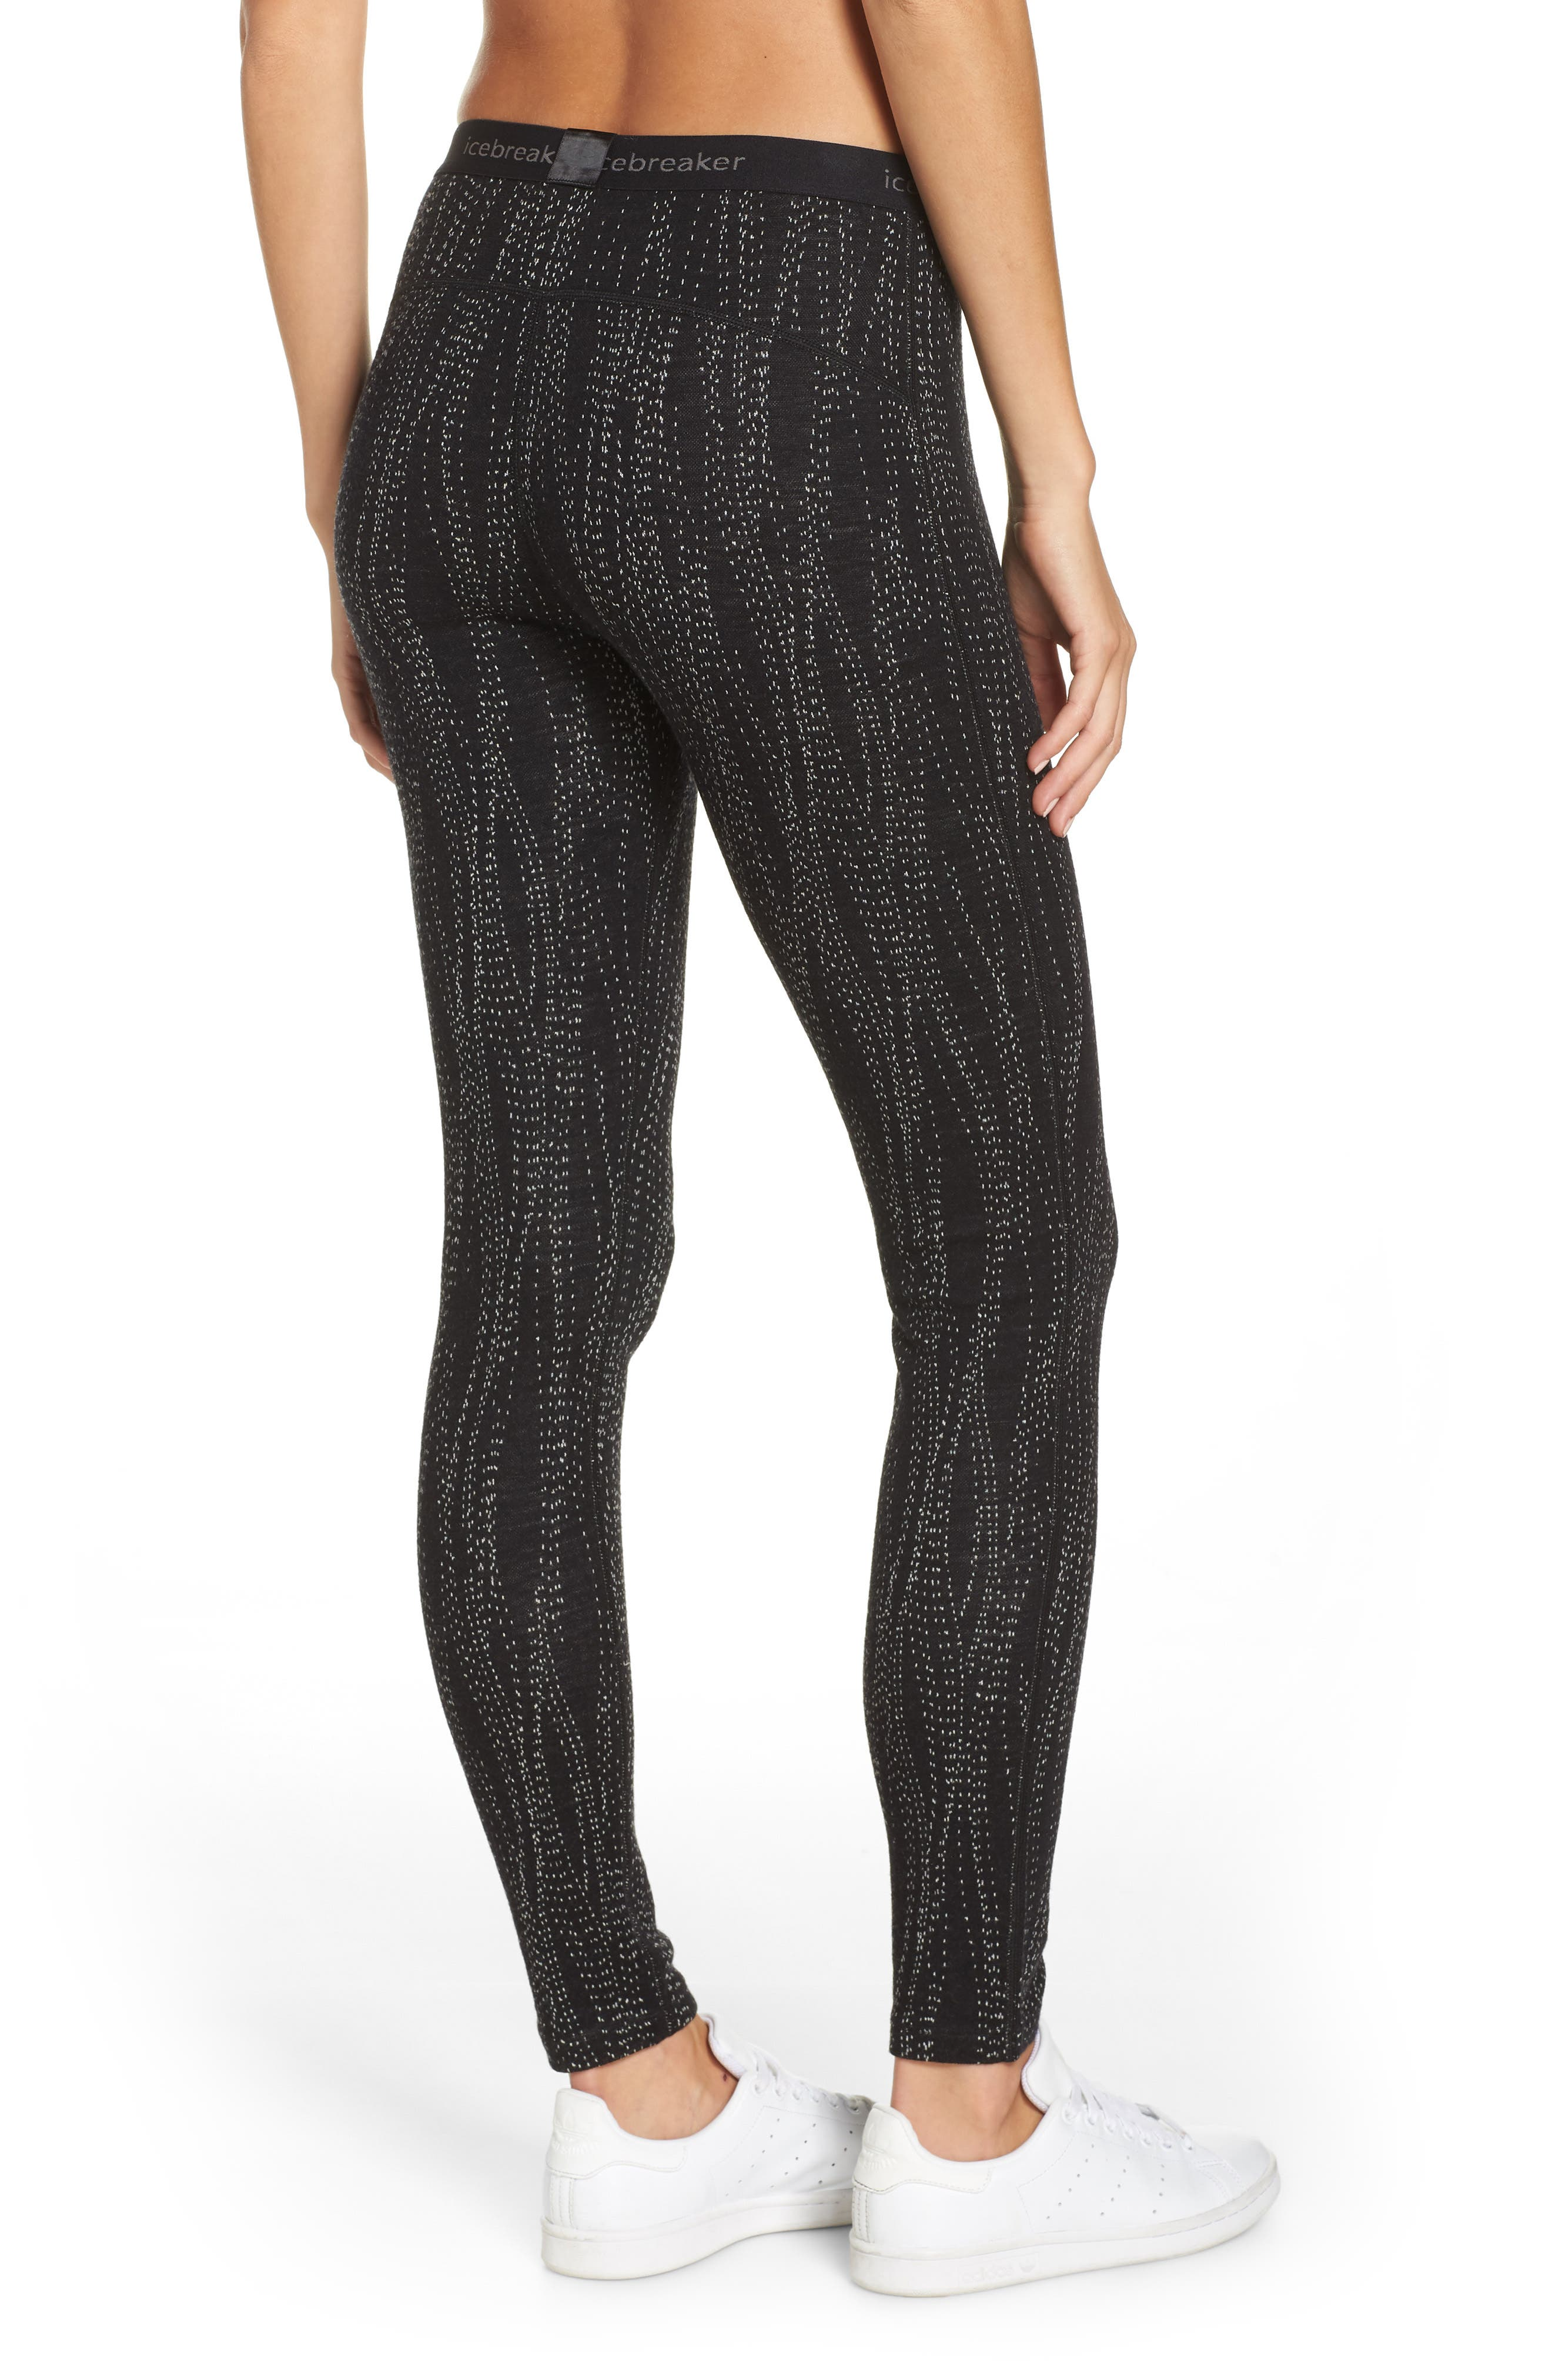 250 Vertex Merino Wool Base Layer Leggings,                             Alternate thumbnail 2, color,                             BLACK/ SNOW